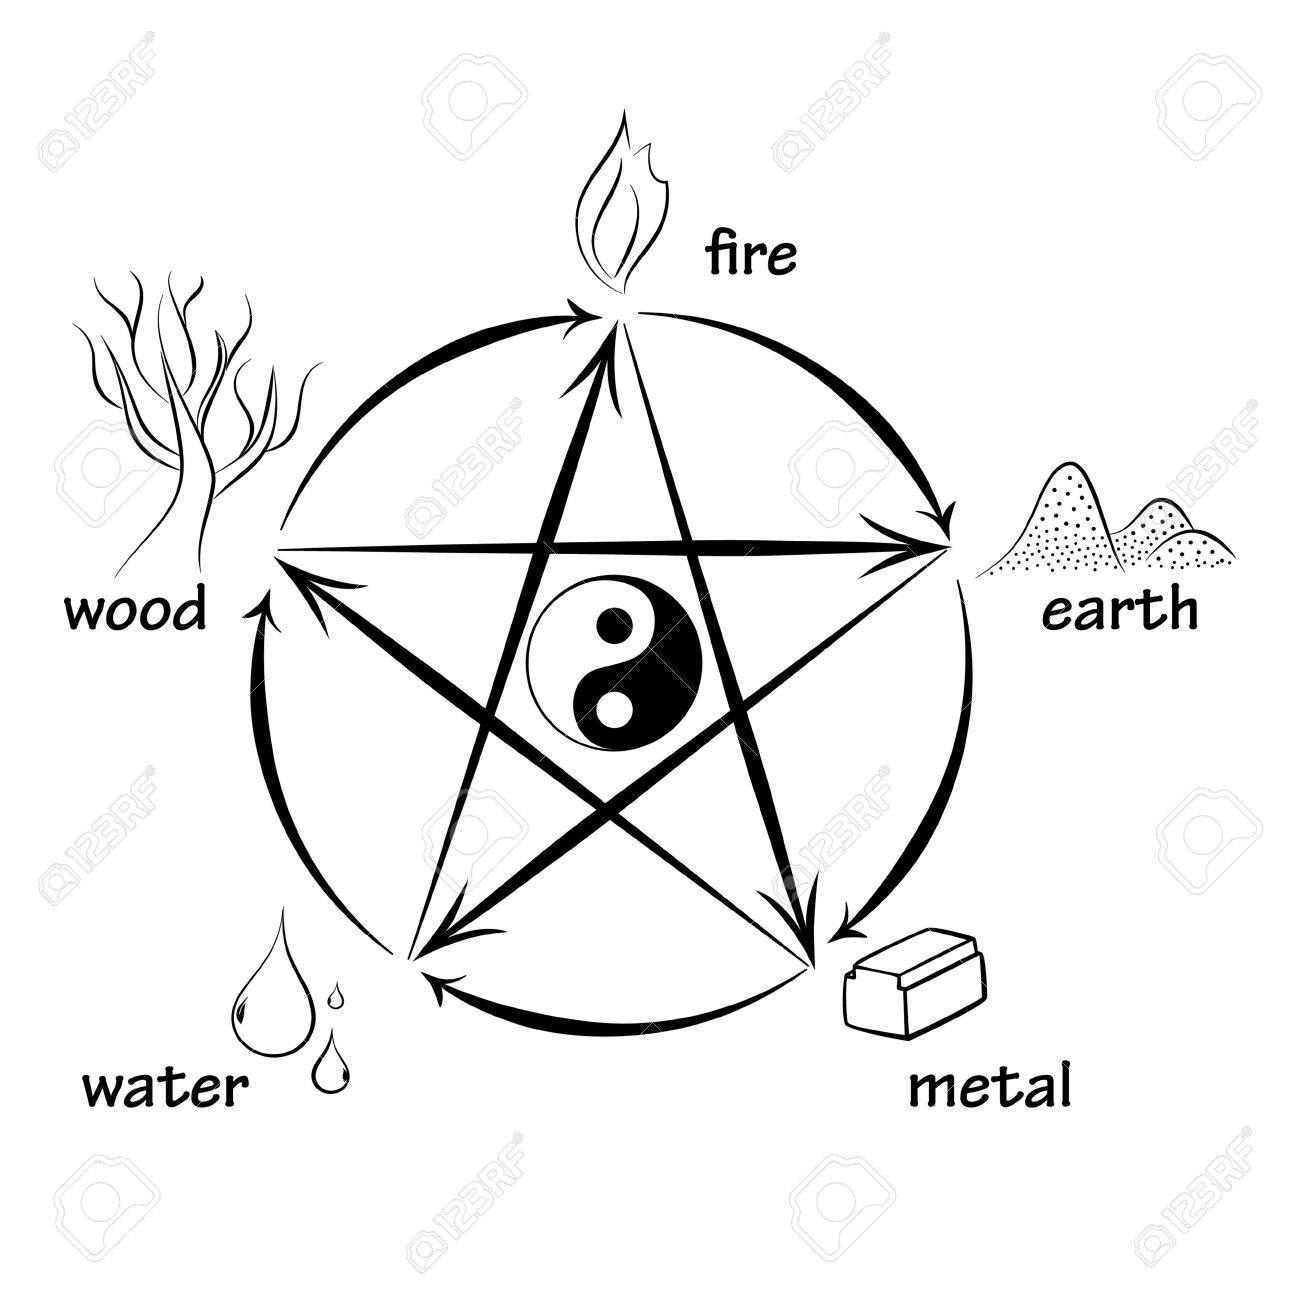 Five elements, creation and destructive circles - 52486314